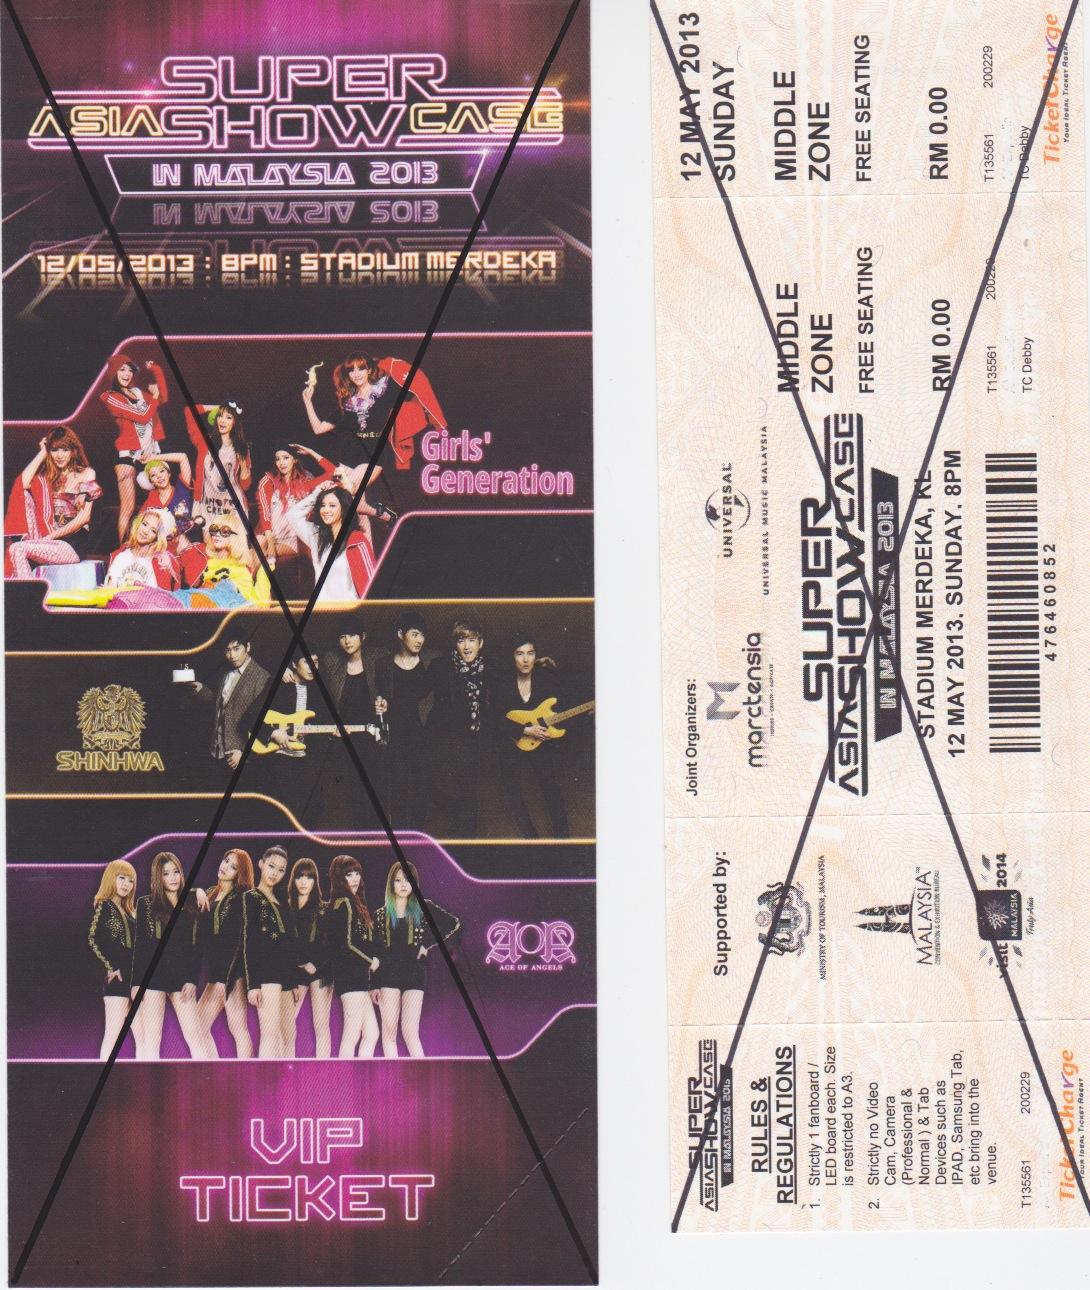 2013 Asia Super Showcase in Malaysia